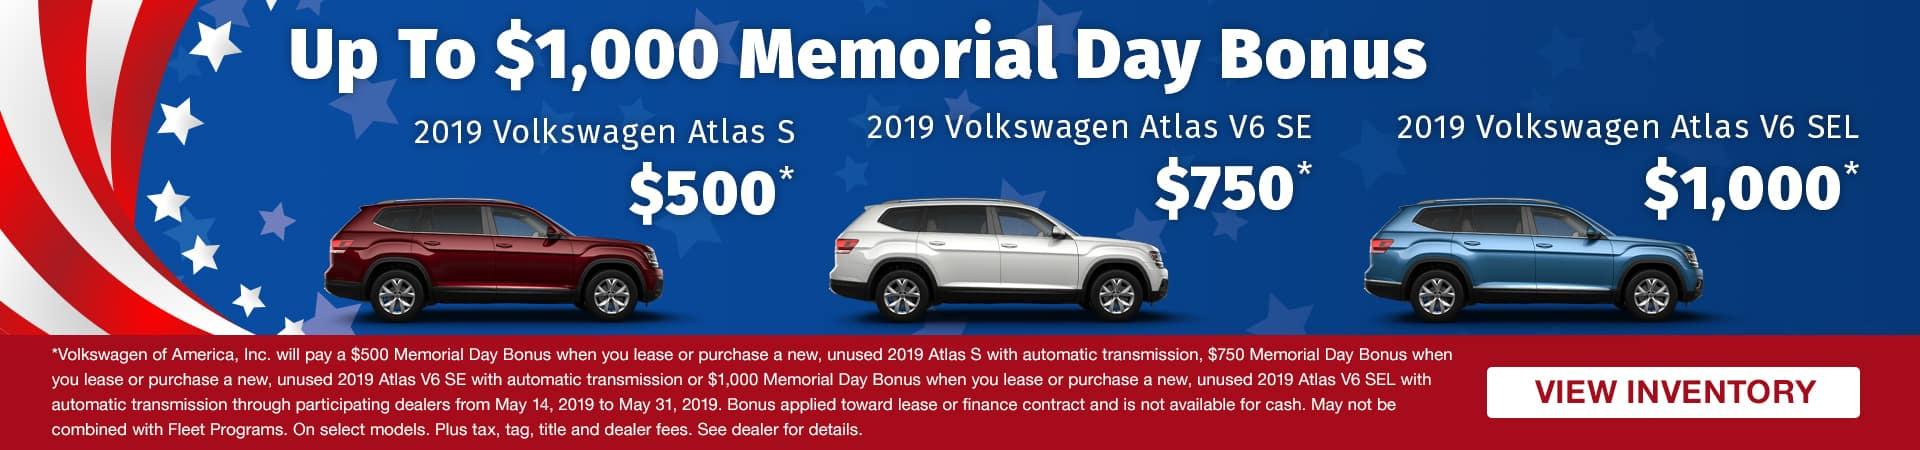 Get up to a $1,000 Memorial Day Bonus on a new 2019 Volkswagen Atlas in Murfreesboro TN